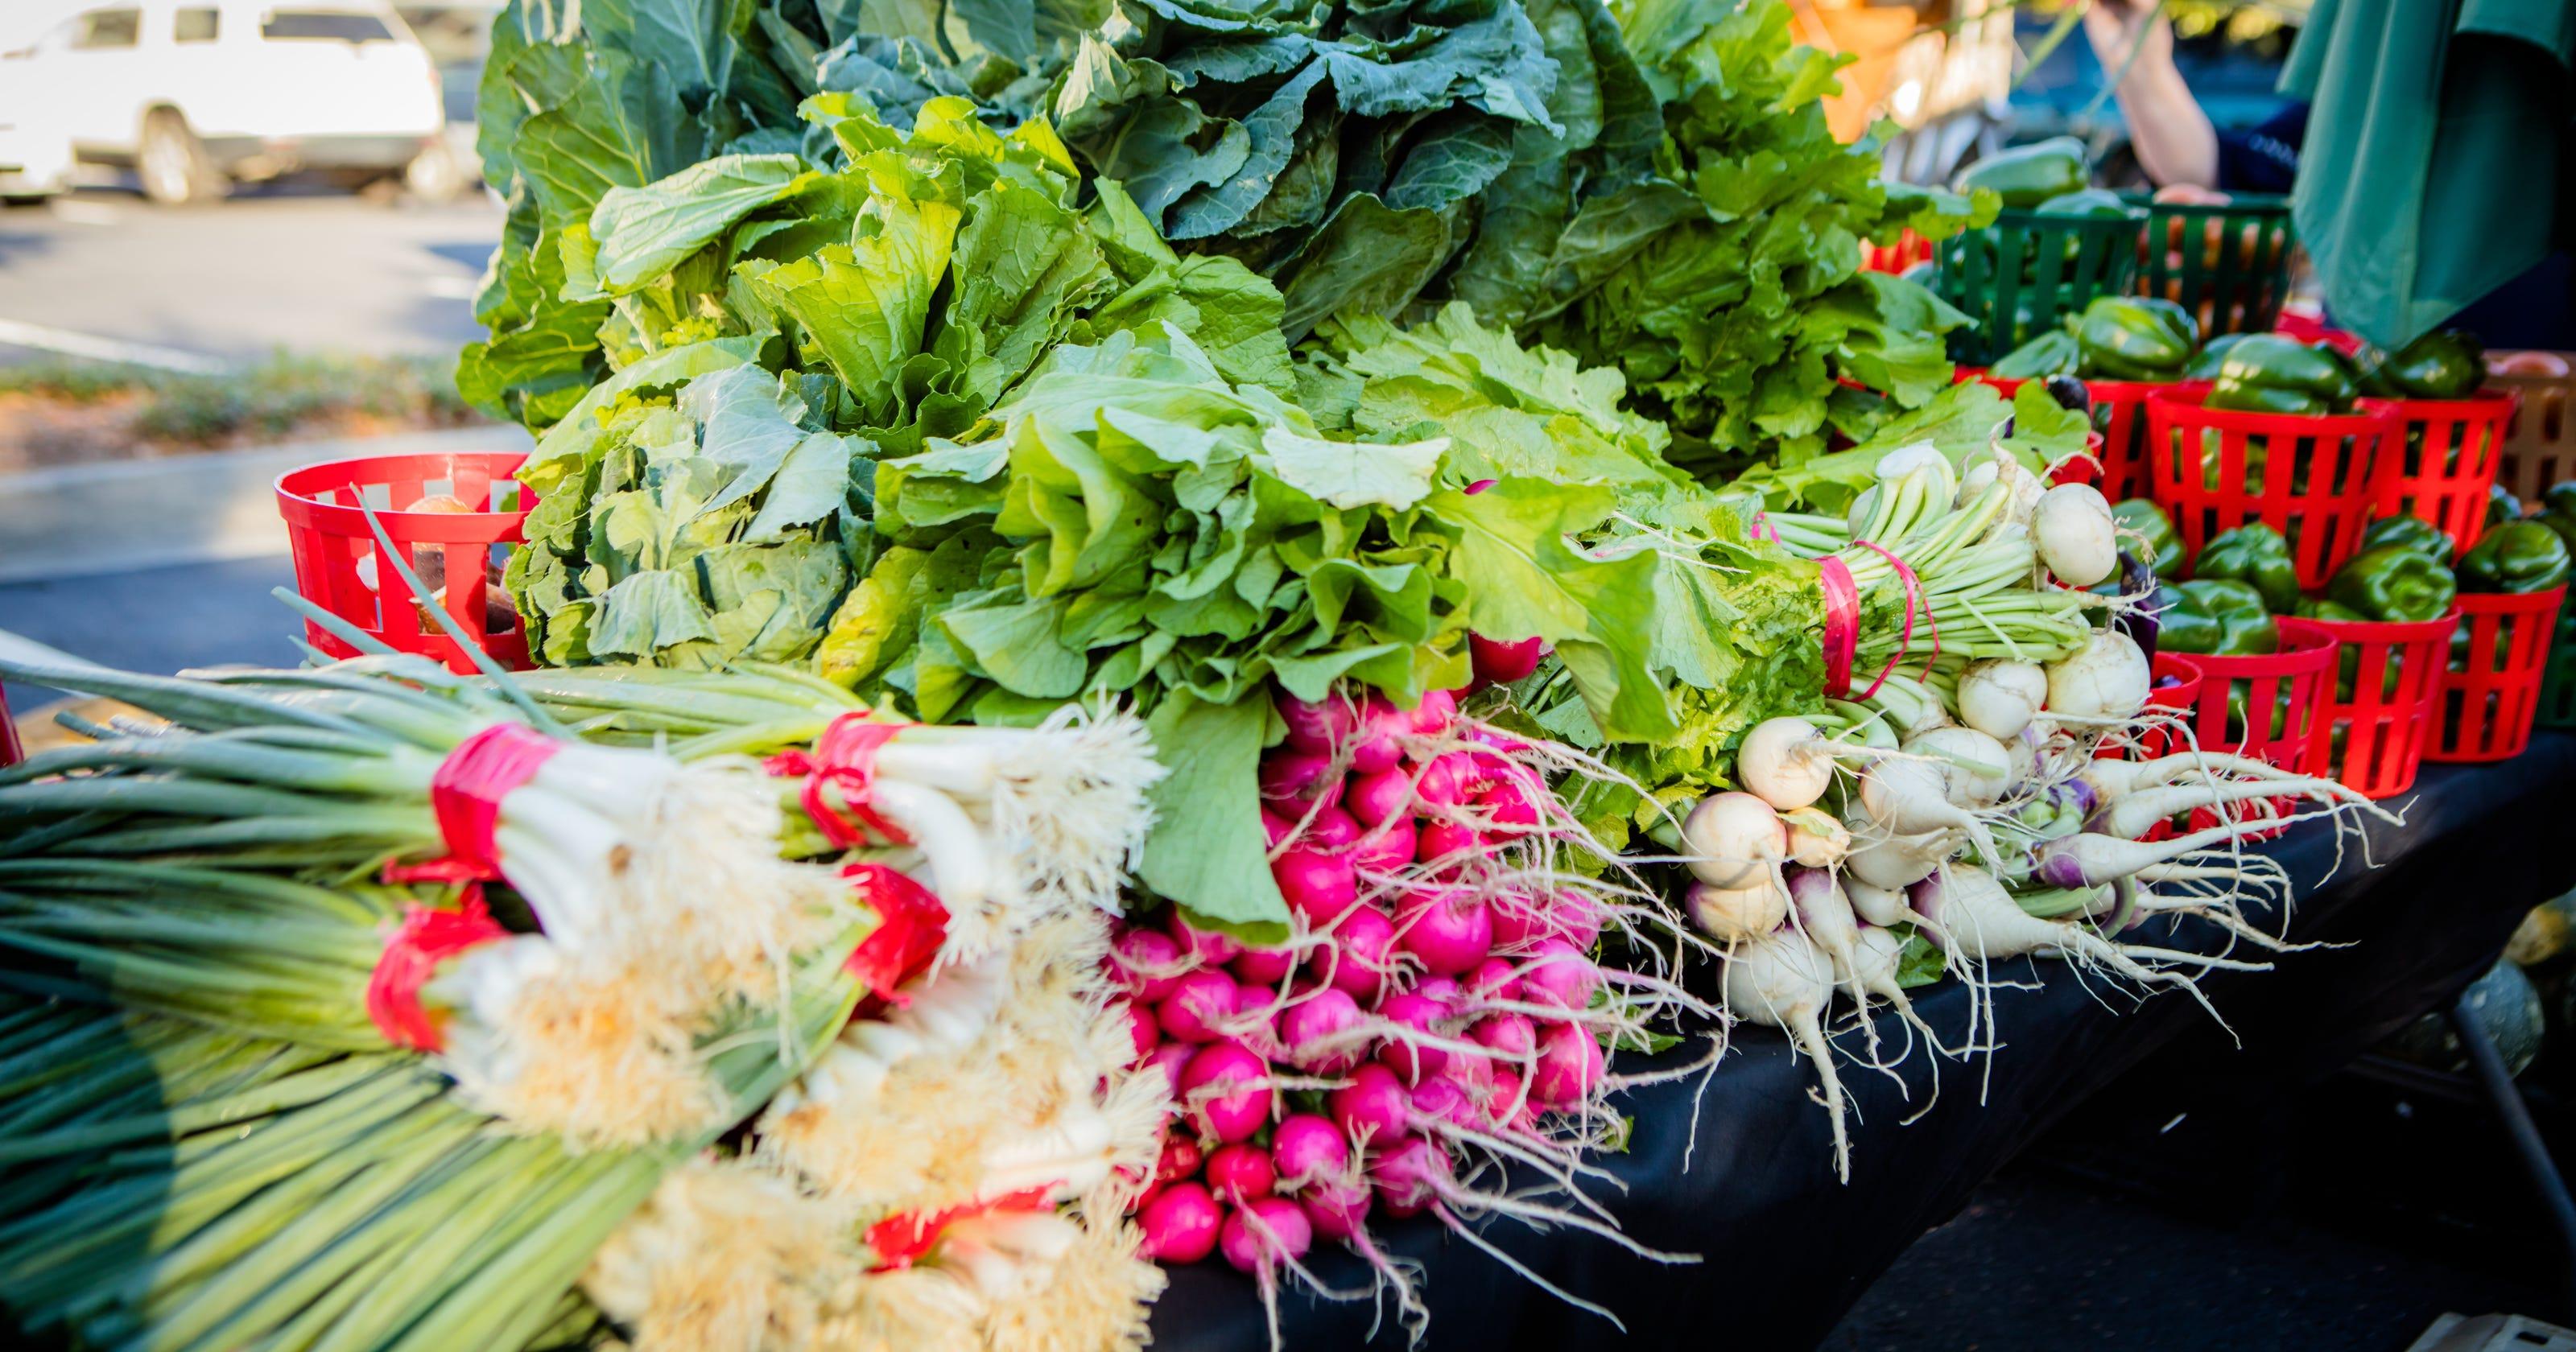 South Madison Farmers Market Has New >> 50 Farmers Markets Across America